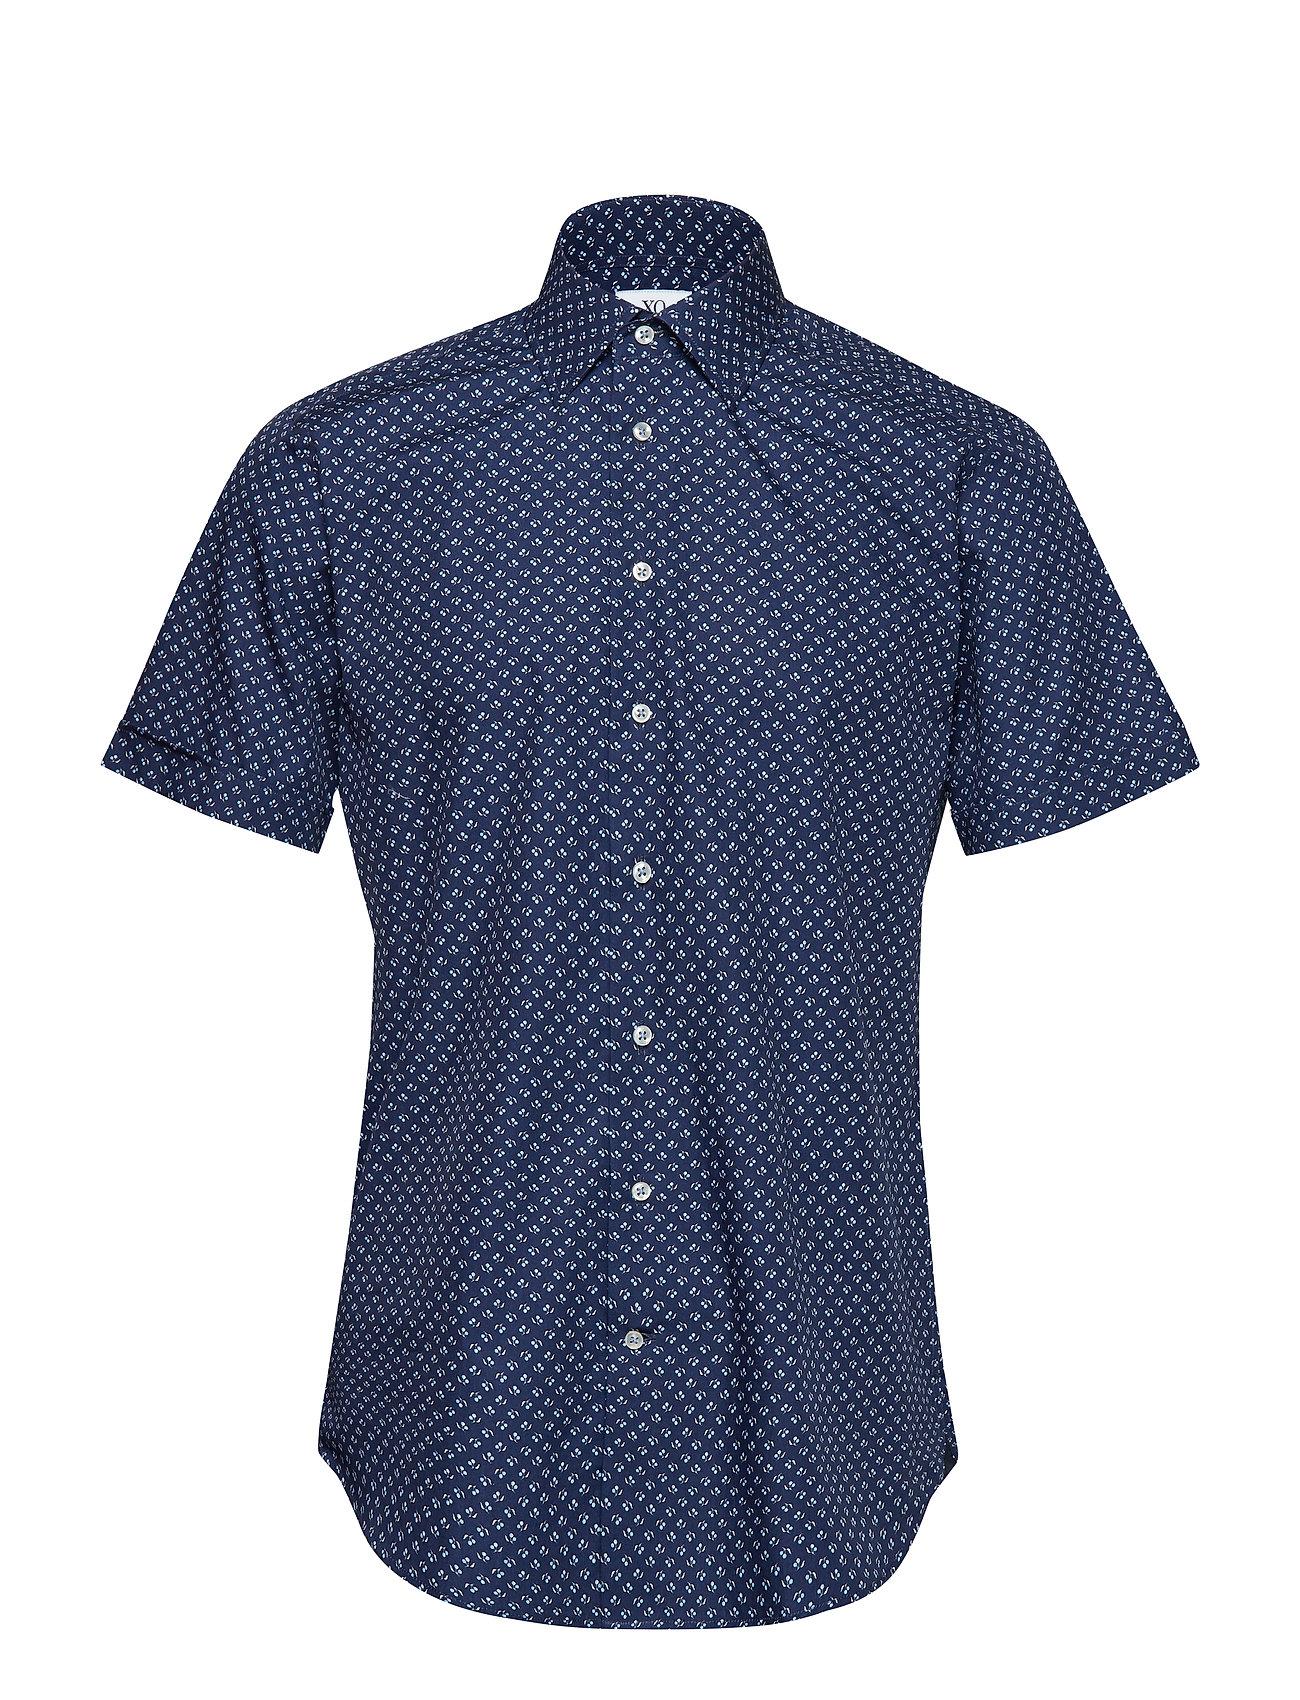 XO Shirtmaker by Sand Copenhagen 8114 Gordon SC SS Ögrönlar